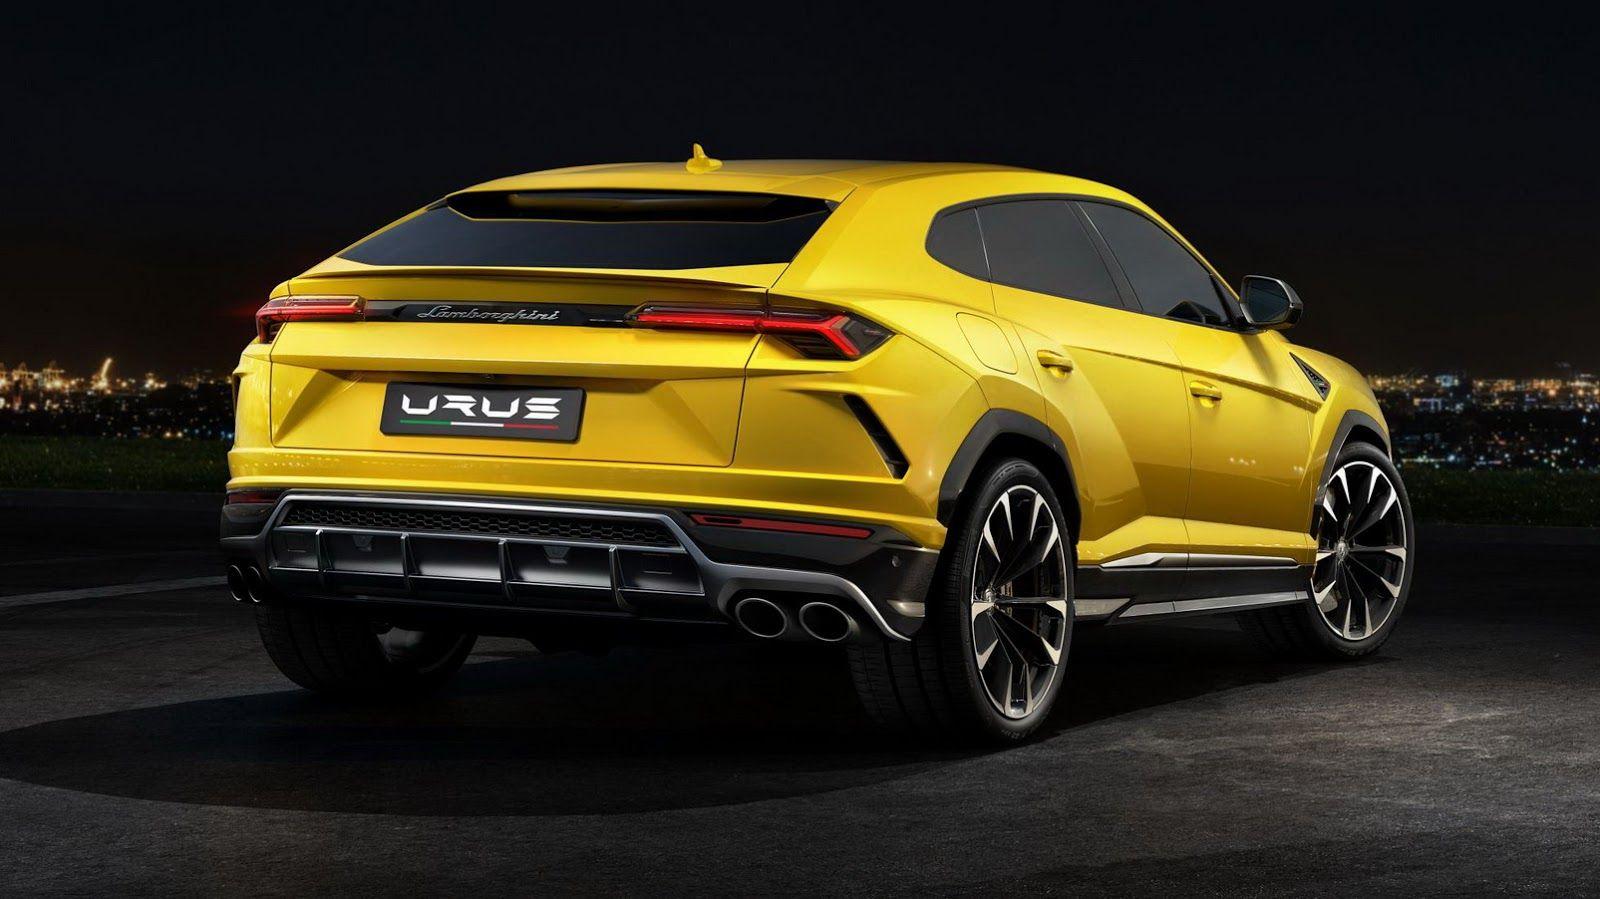 Lamborghini Launches Urus Super Suv Gives It 641hp To Play With Carscoops Lamborghini Car Backgrounds Lamborghini Cars